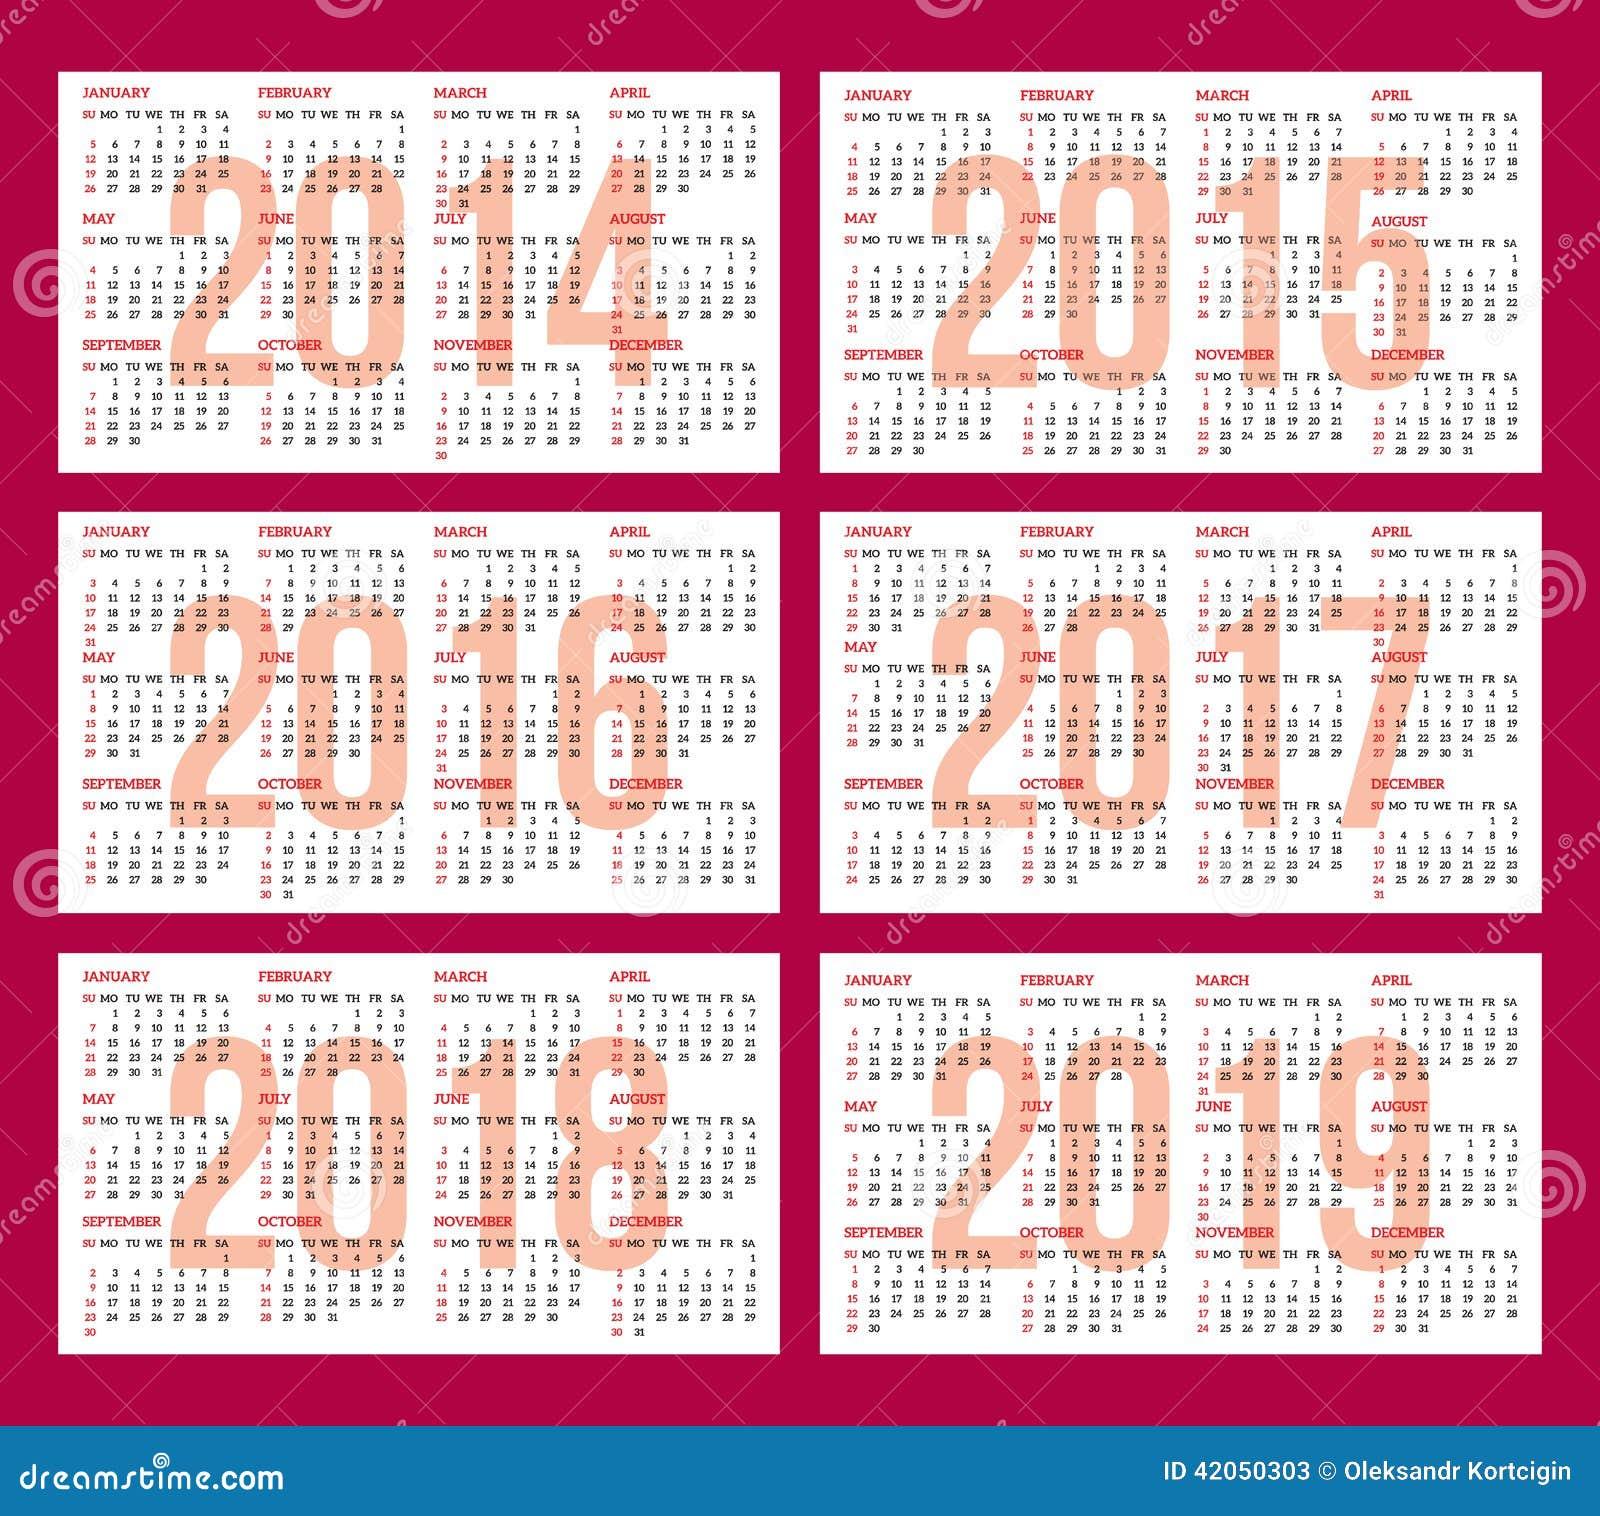 calendar grid for 2014 2015 2016 2017 2018 2019 stock vector